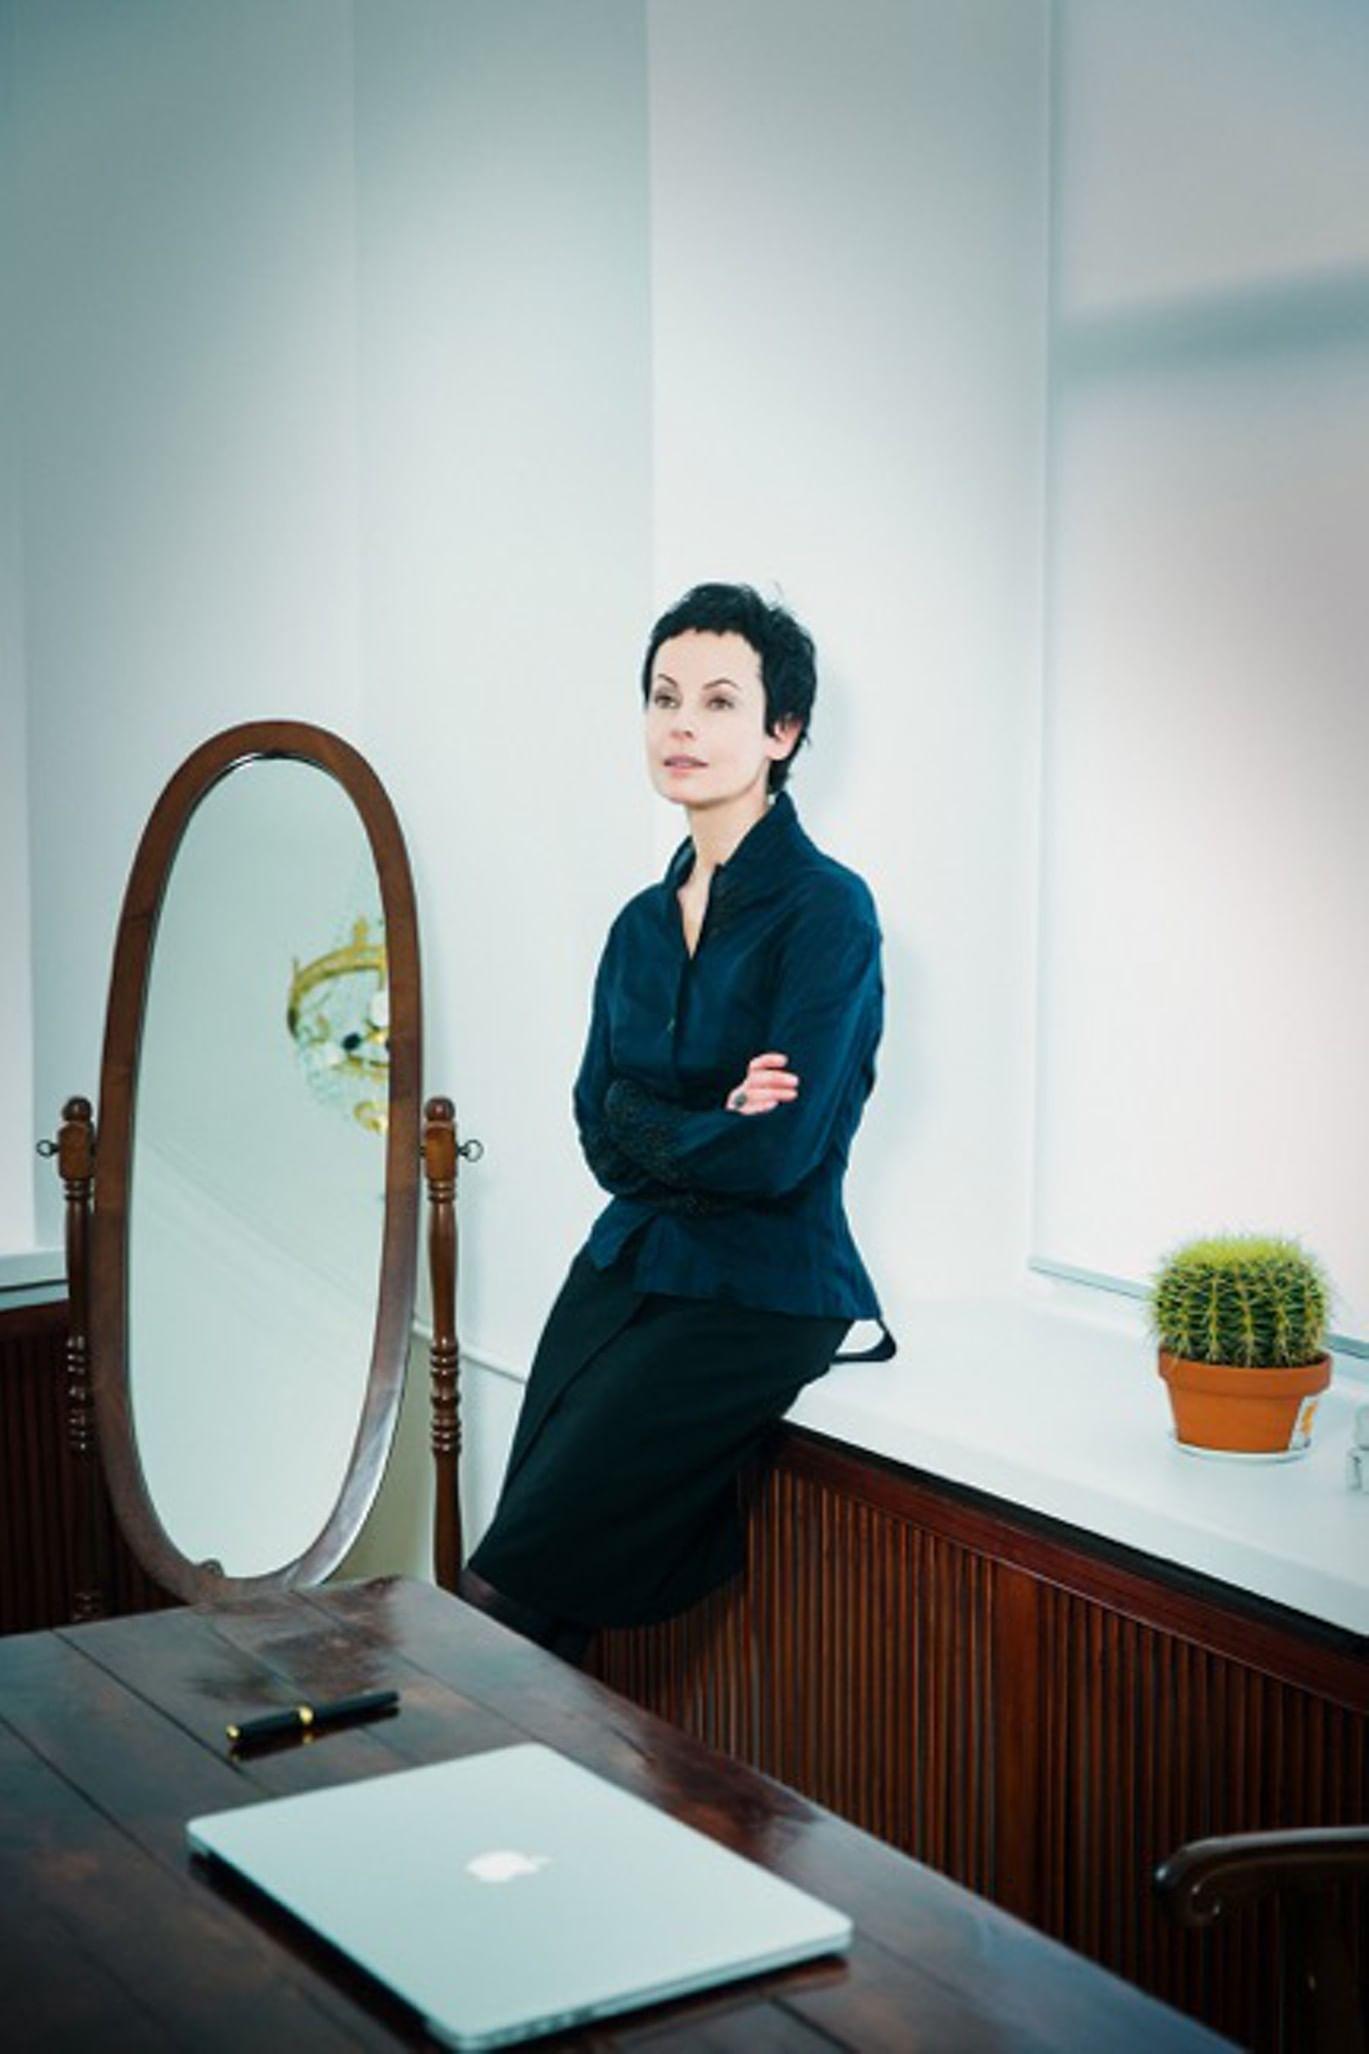 Ирина Апексимова. Фотографии из личного архива героини